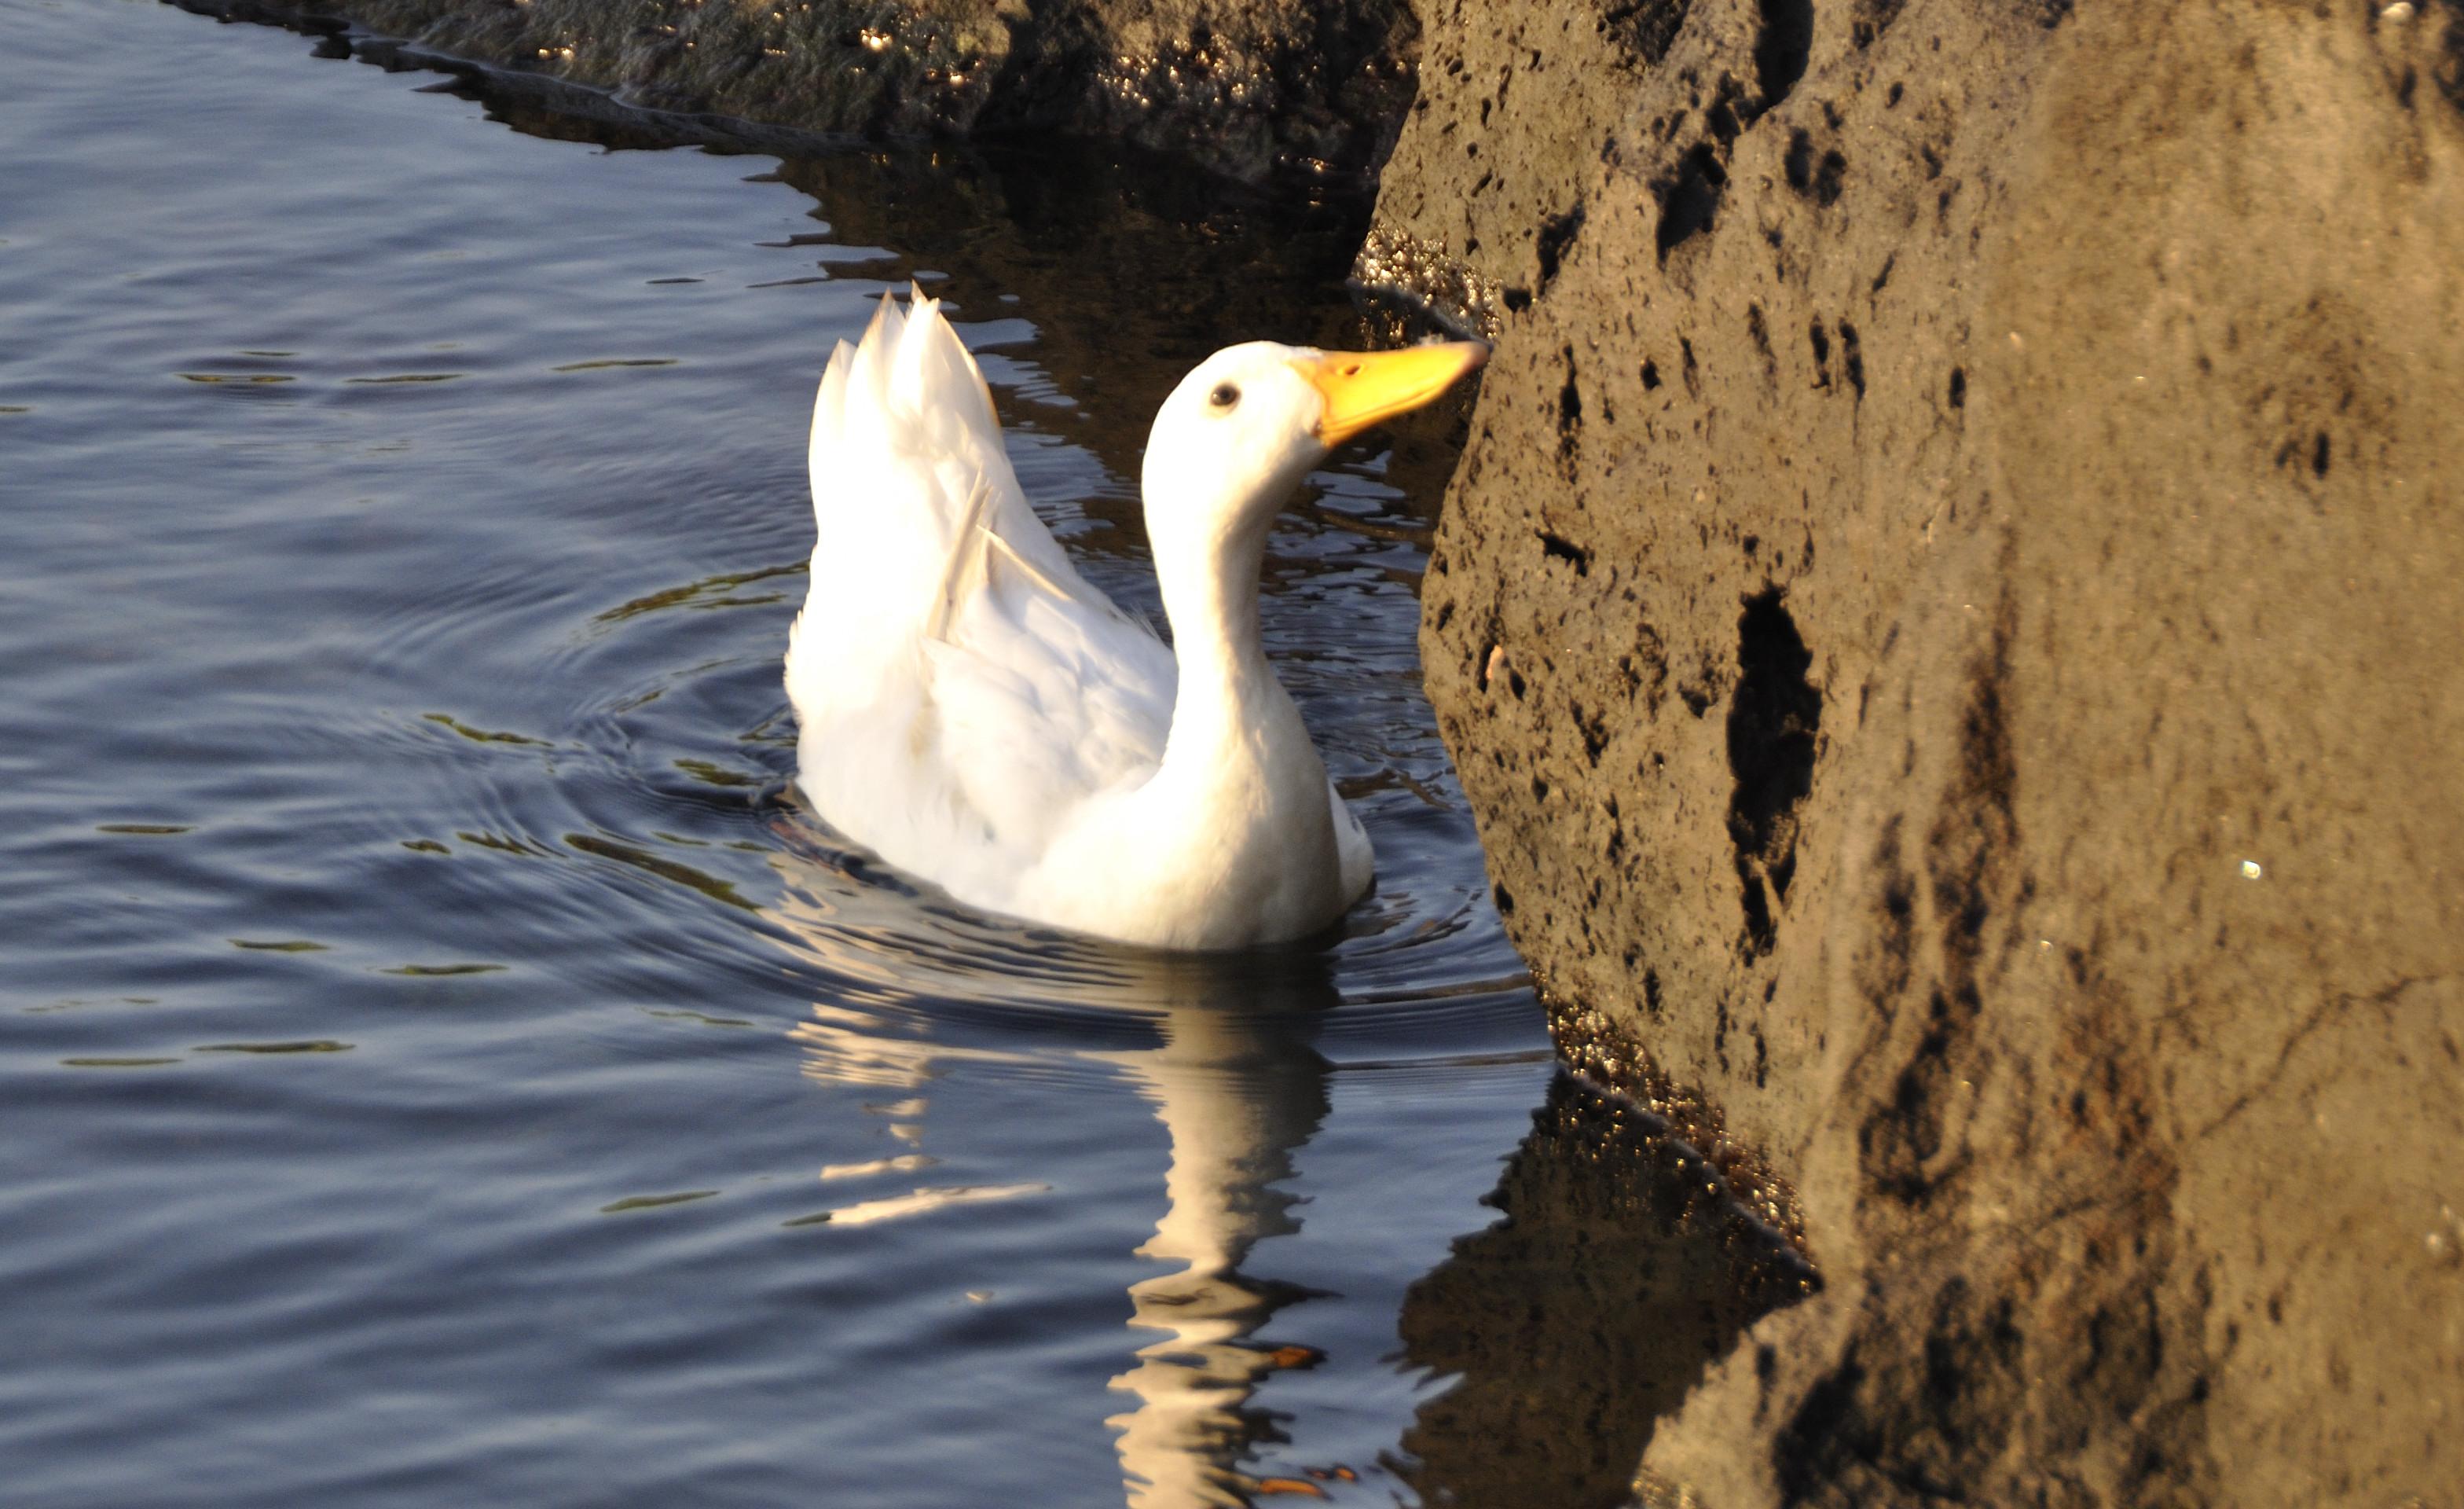 Ducks at porto ulisse ognina catania sicilia taly - creative commons by gnuckx photo